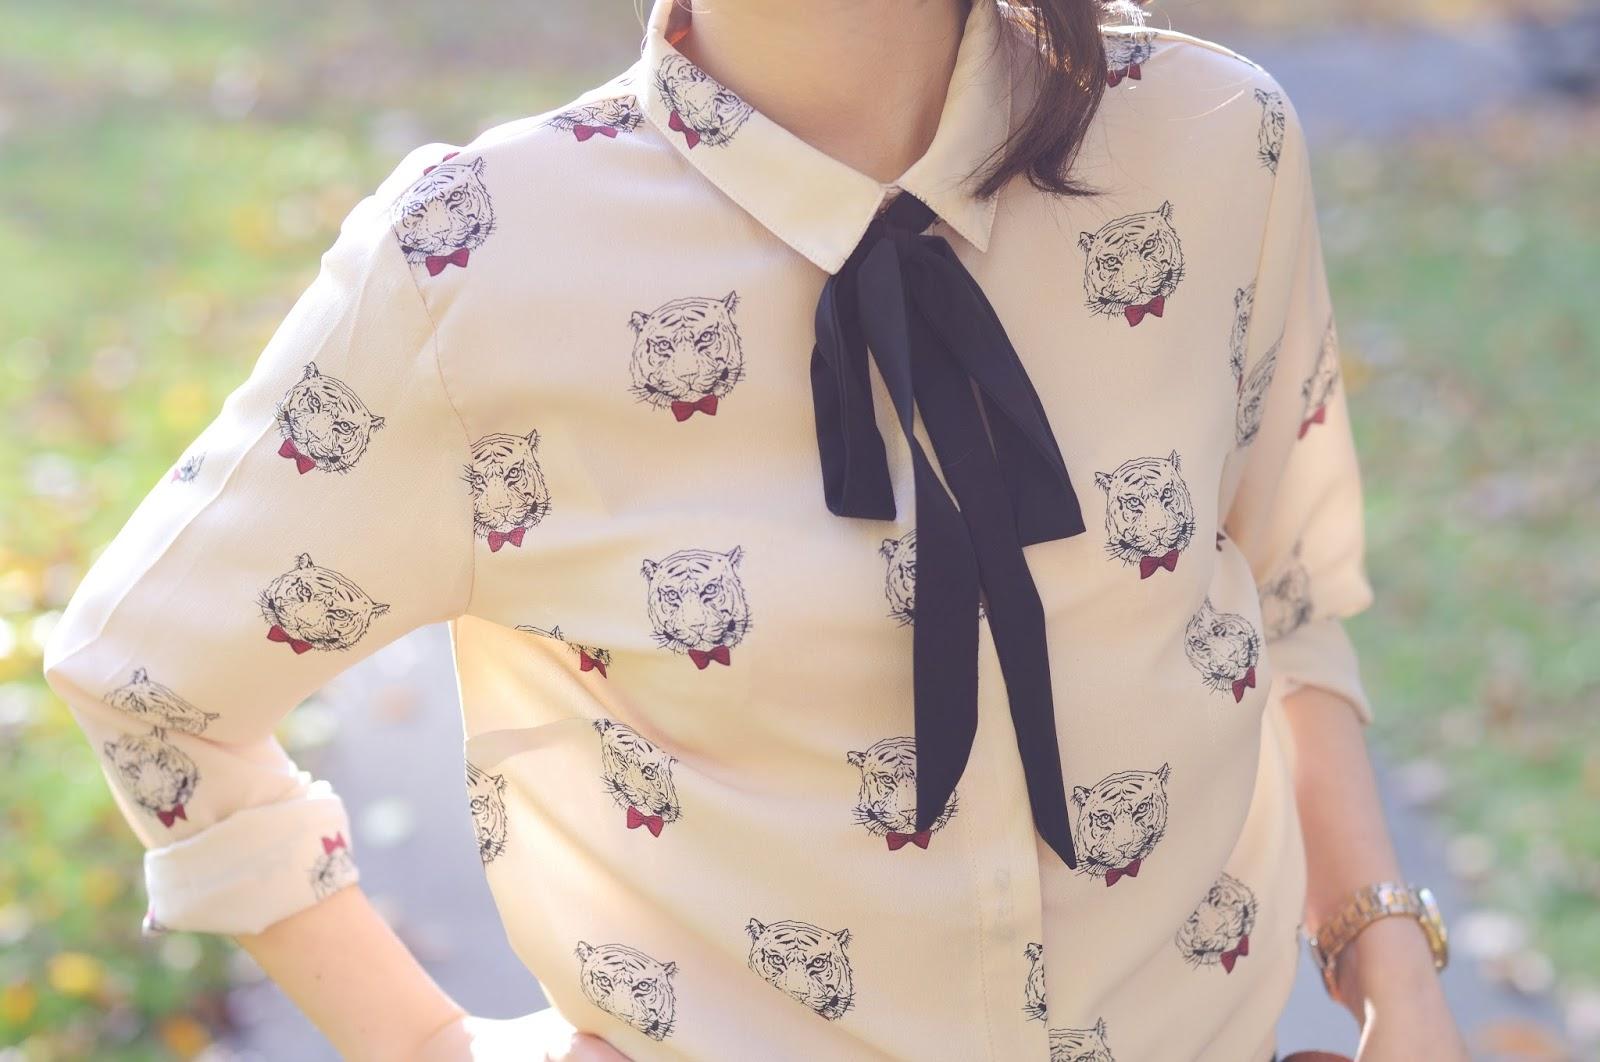 women's shirts, how to wear shirts in Winter